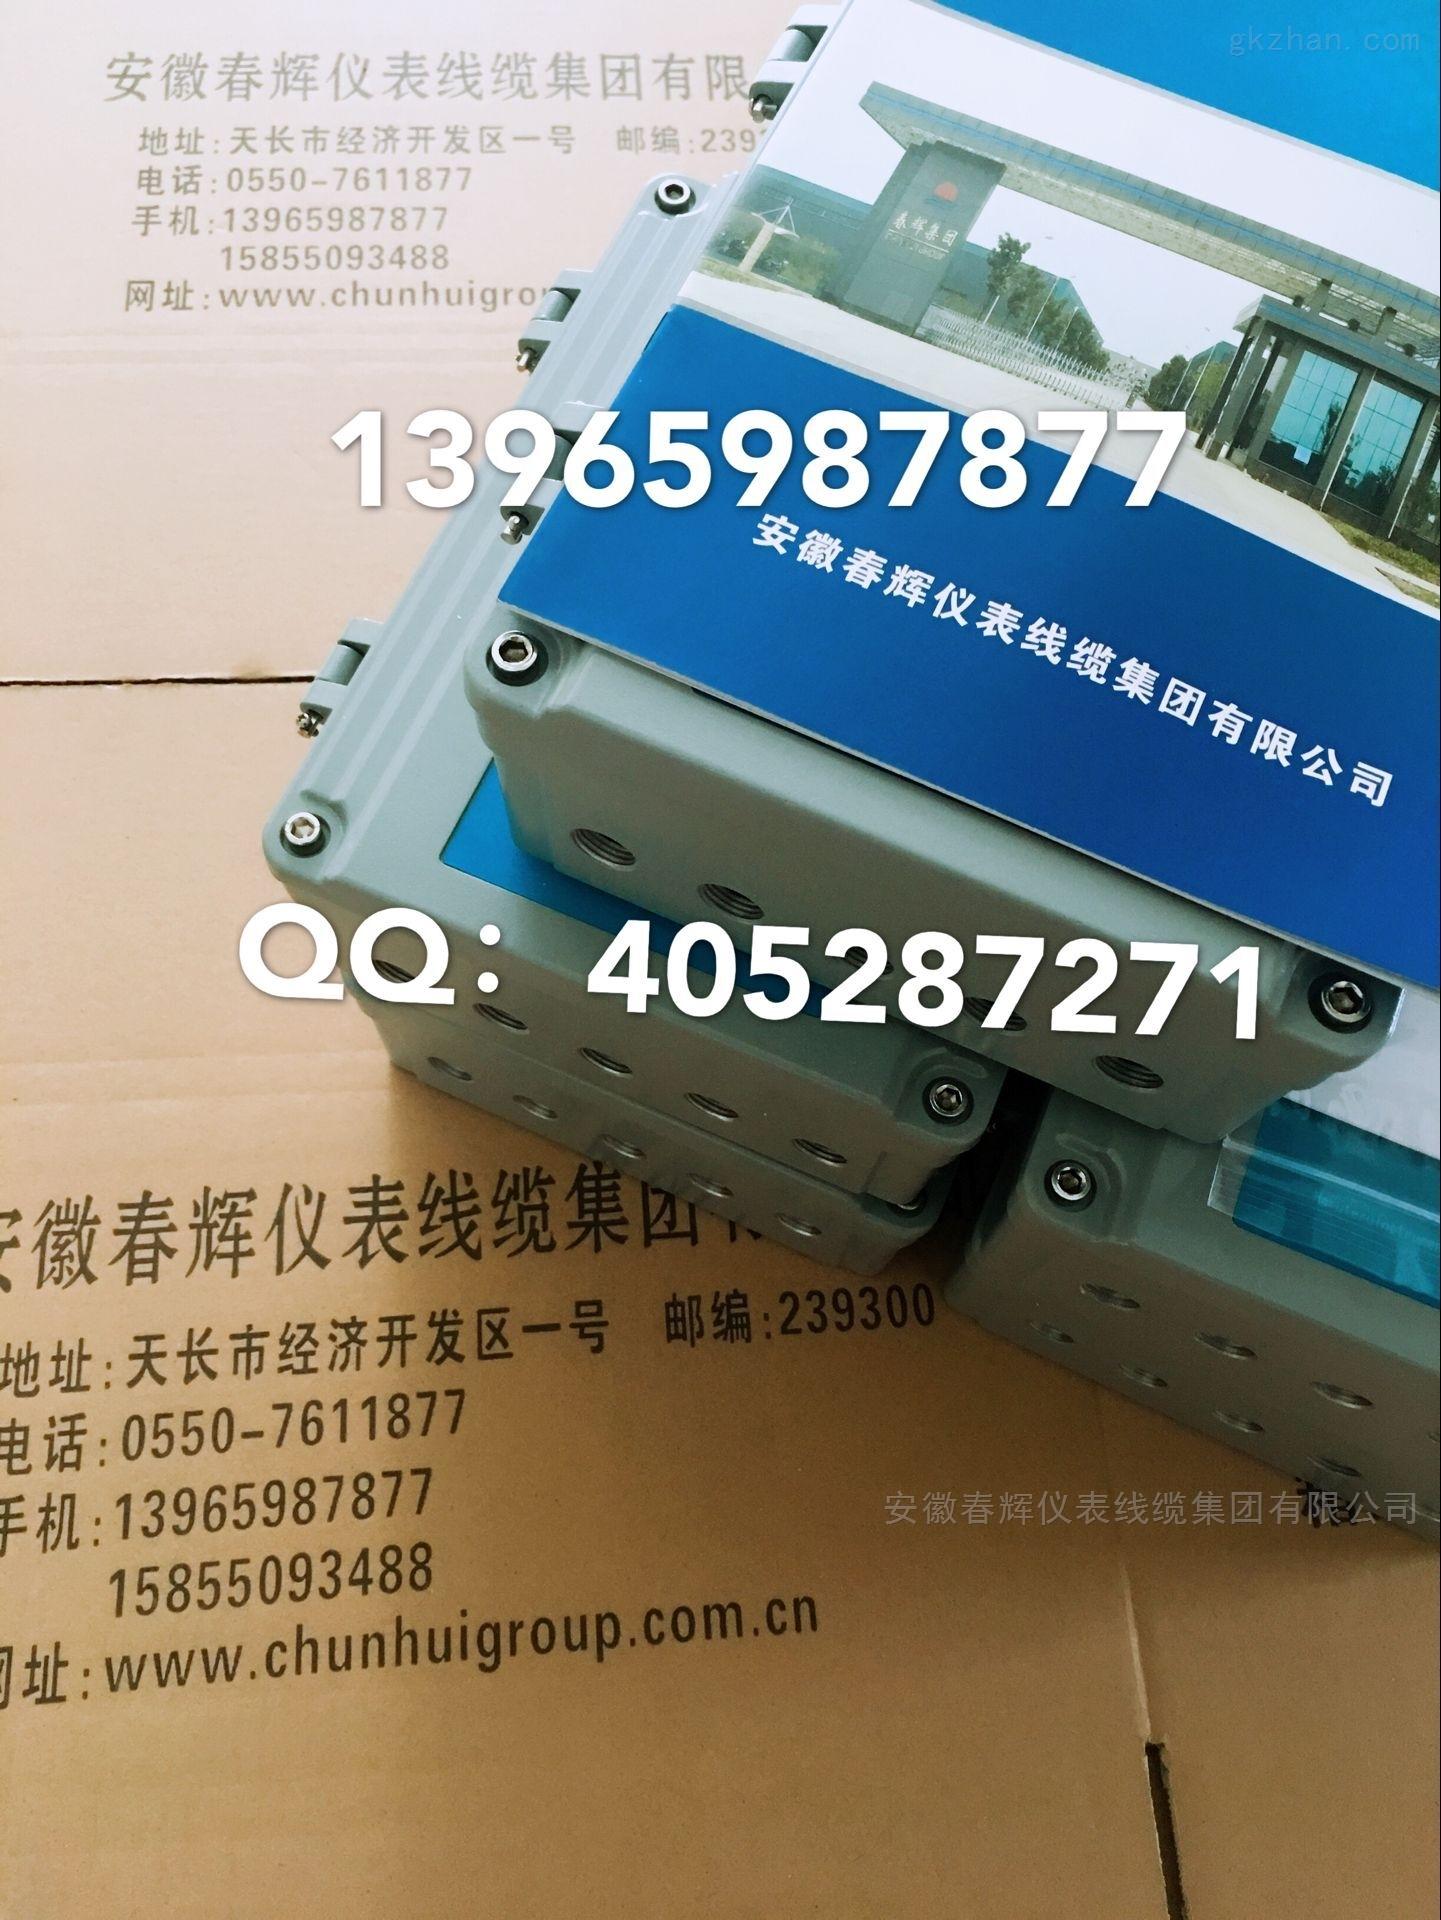 MD55D-EXD-01-R012-5-05-00,YMLVD01010000